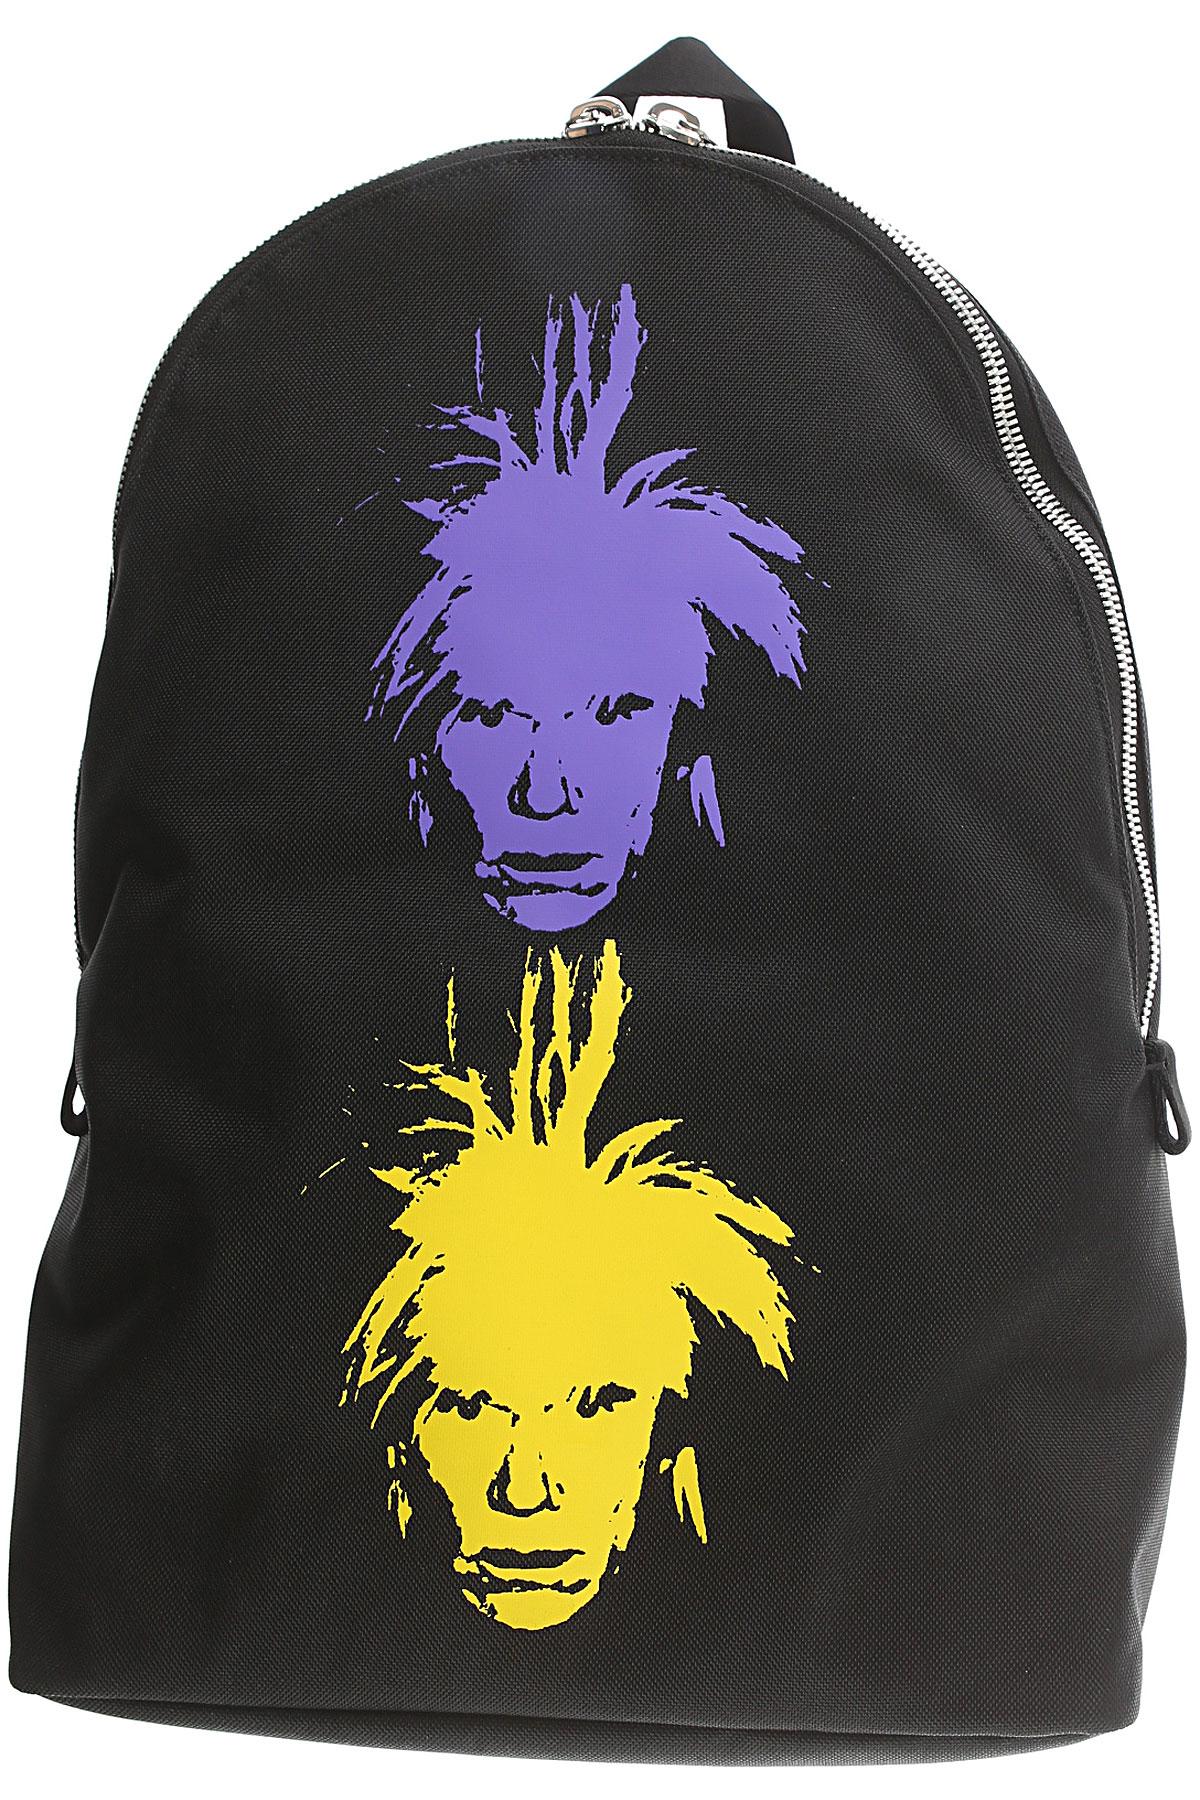 Image of Calvin Klein Backpack for Men, Black, Fabric, 2017